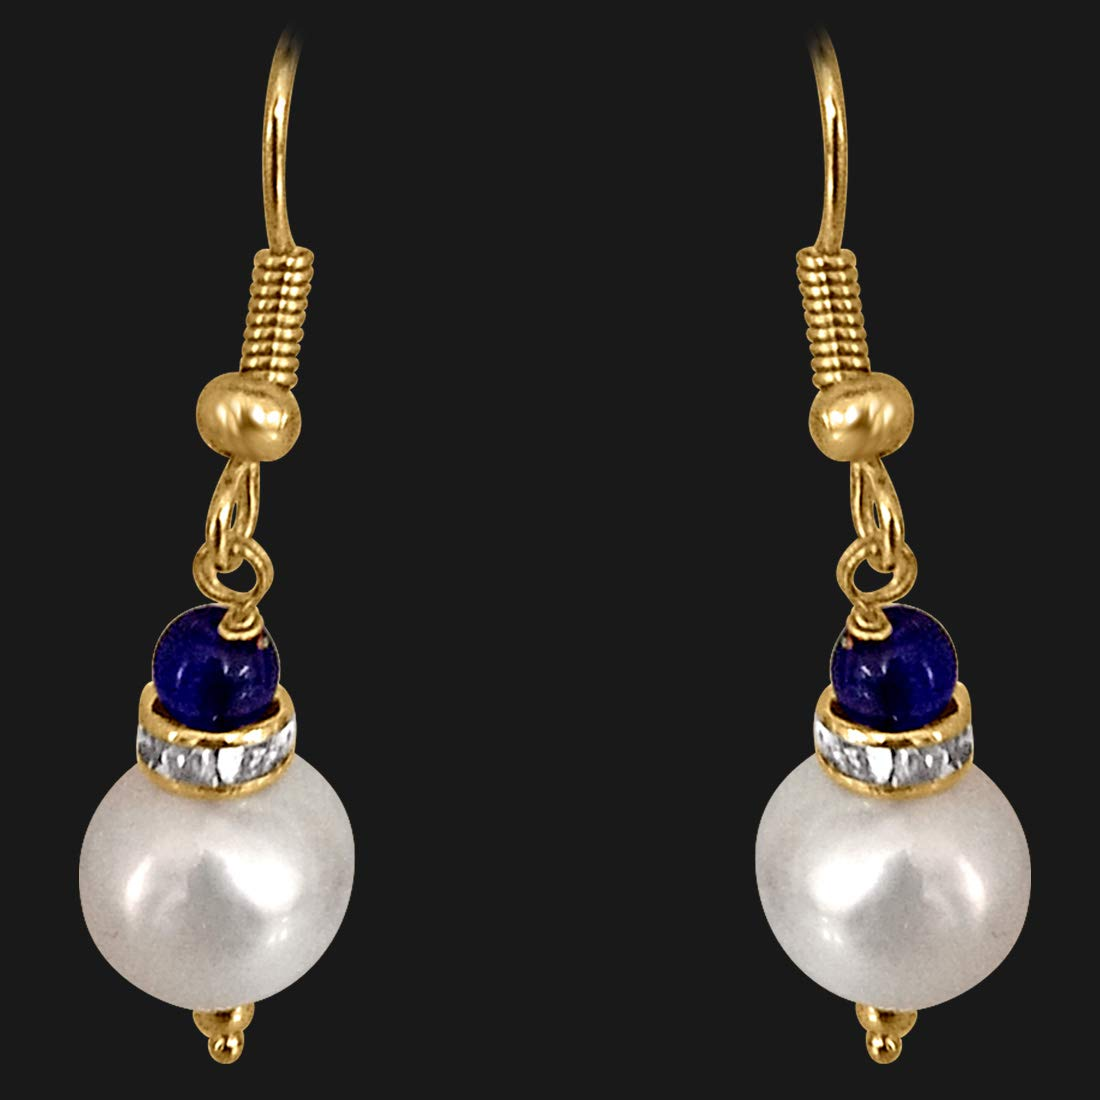 Real Big Pearl & Blue Stone Earrings (SE213)